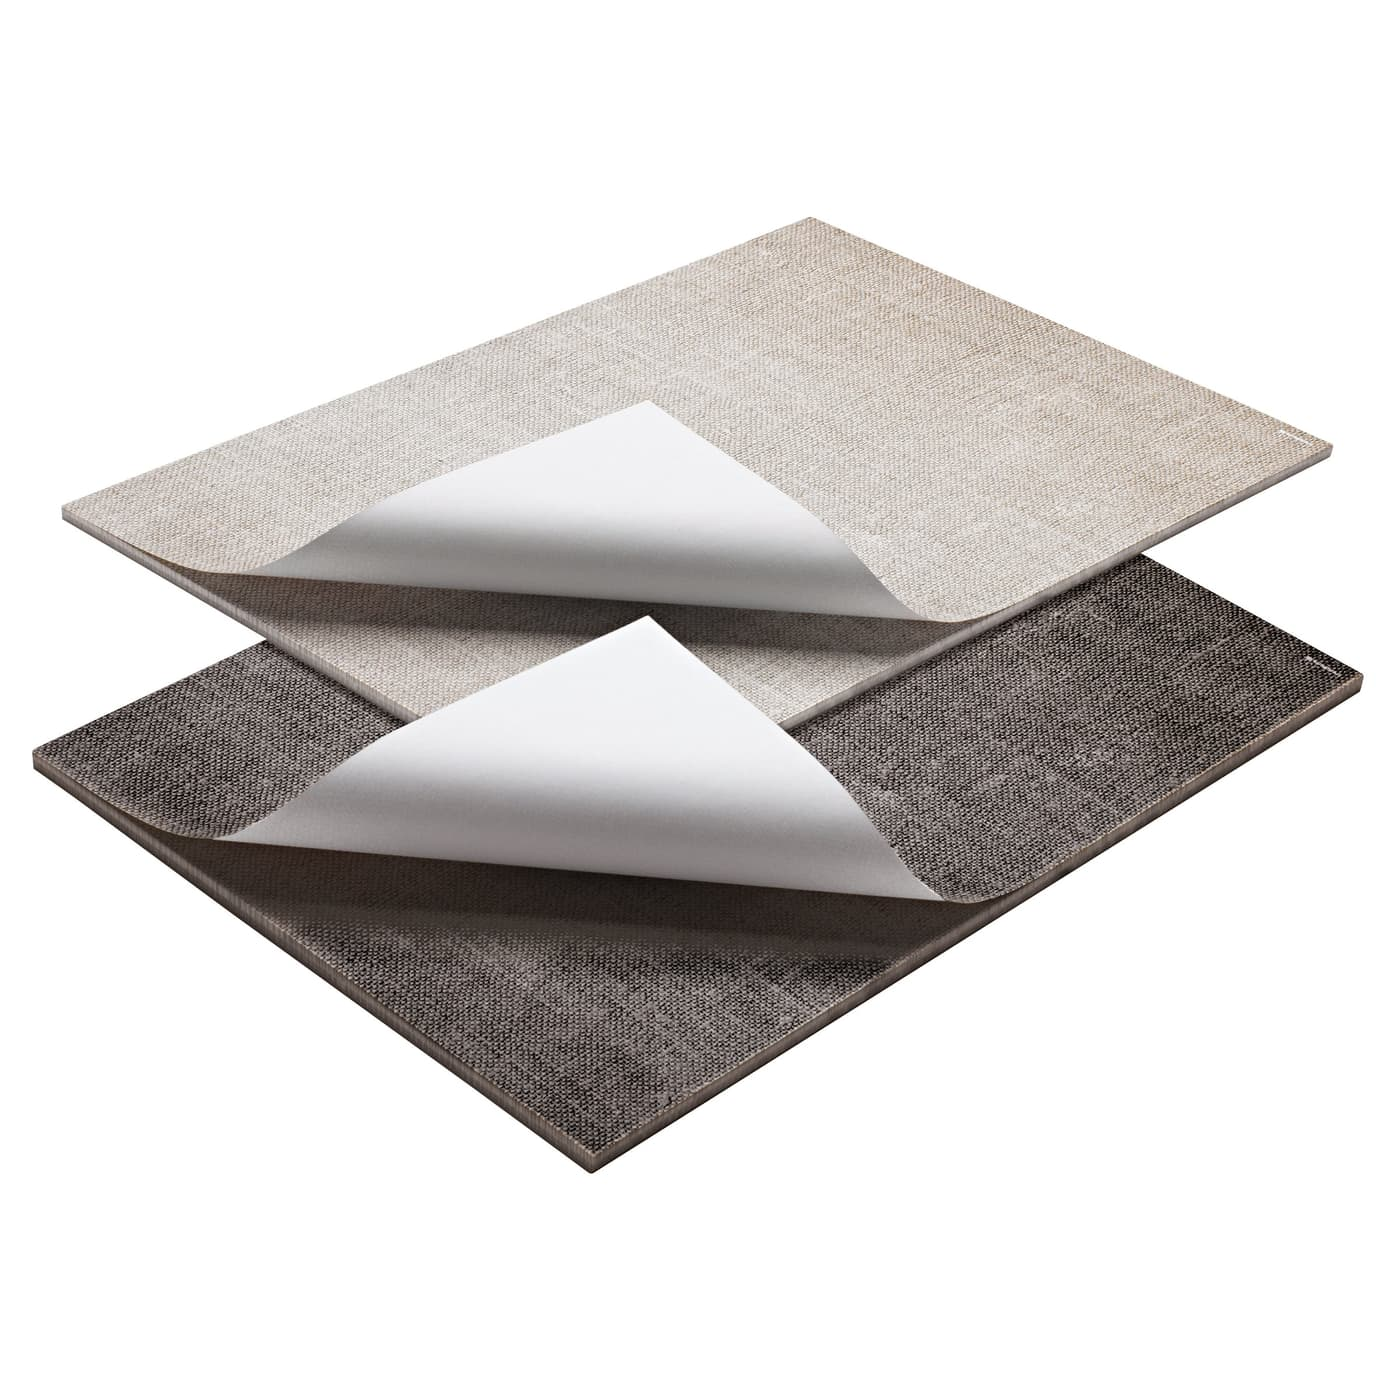 loane set de table en papier migros. Black Bedroom Furniture Sets. Home Design Ideas